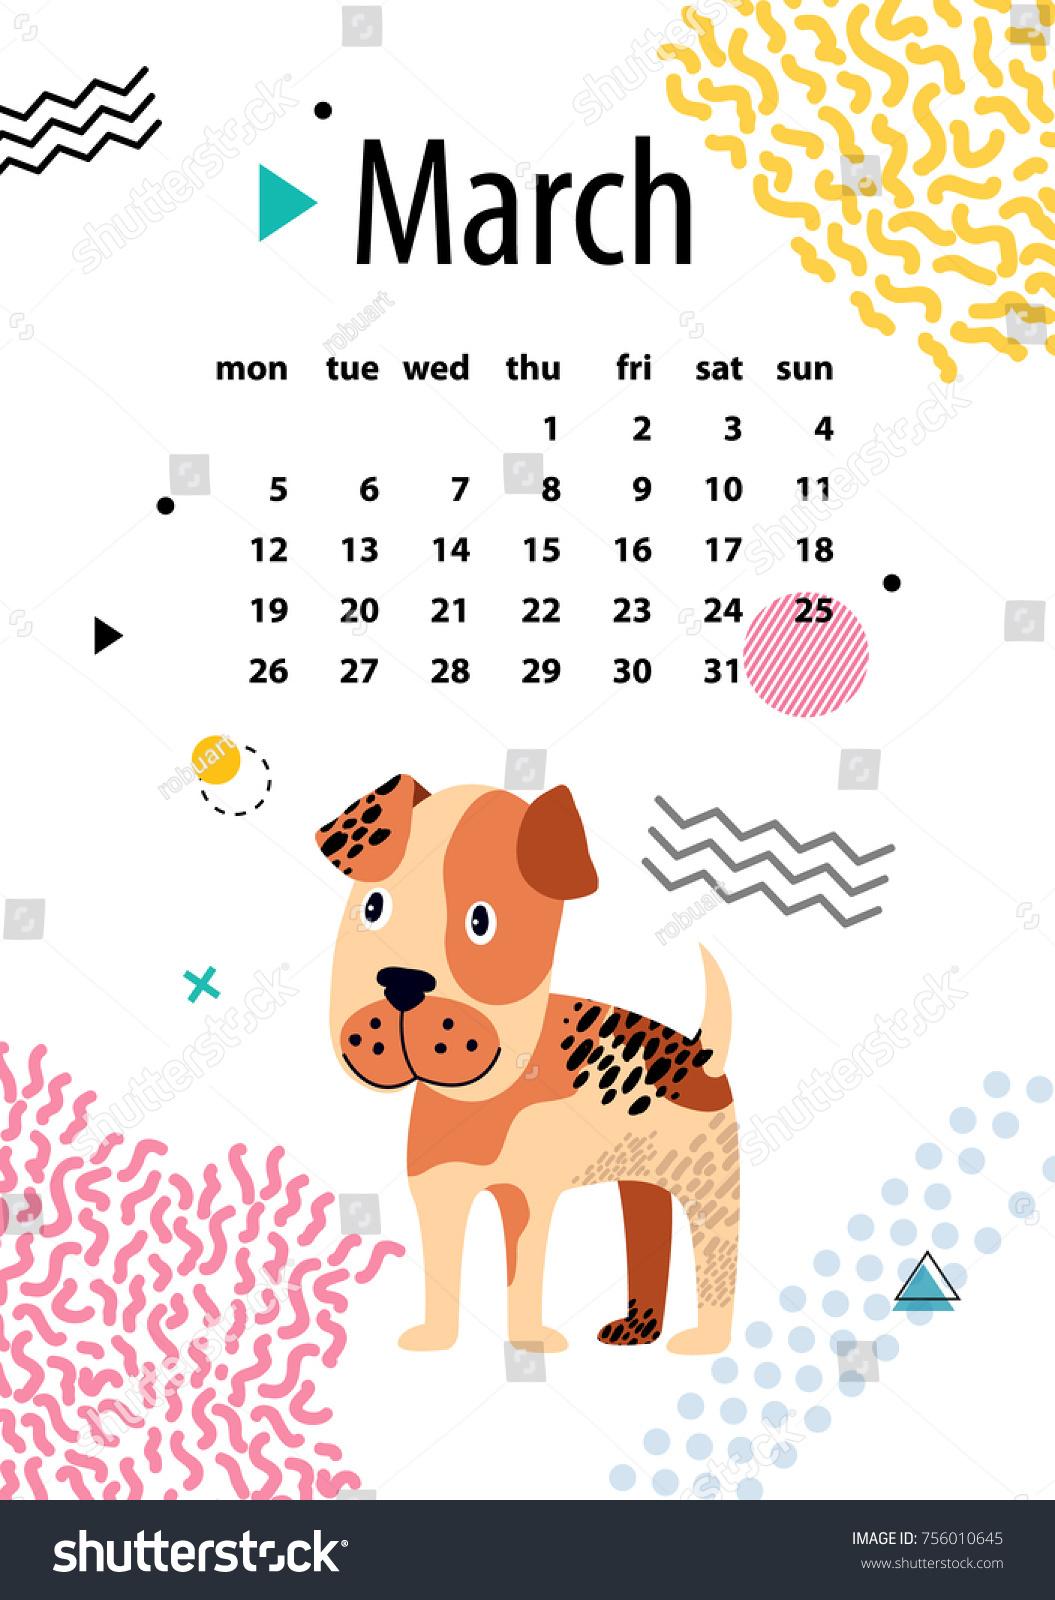 Precede Sun Nei Calendario Inglesi.Immagine Vettoriale A Tema March Calendar 2018 Year Boxer